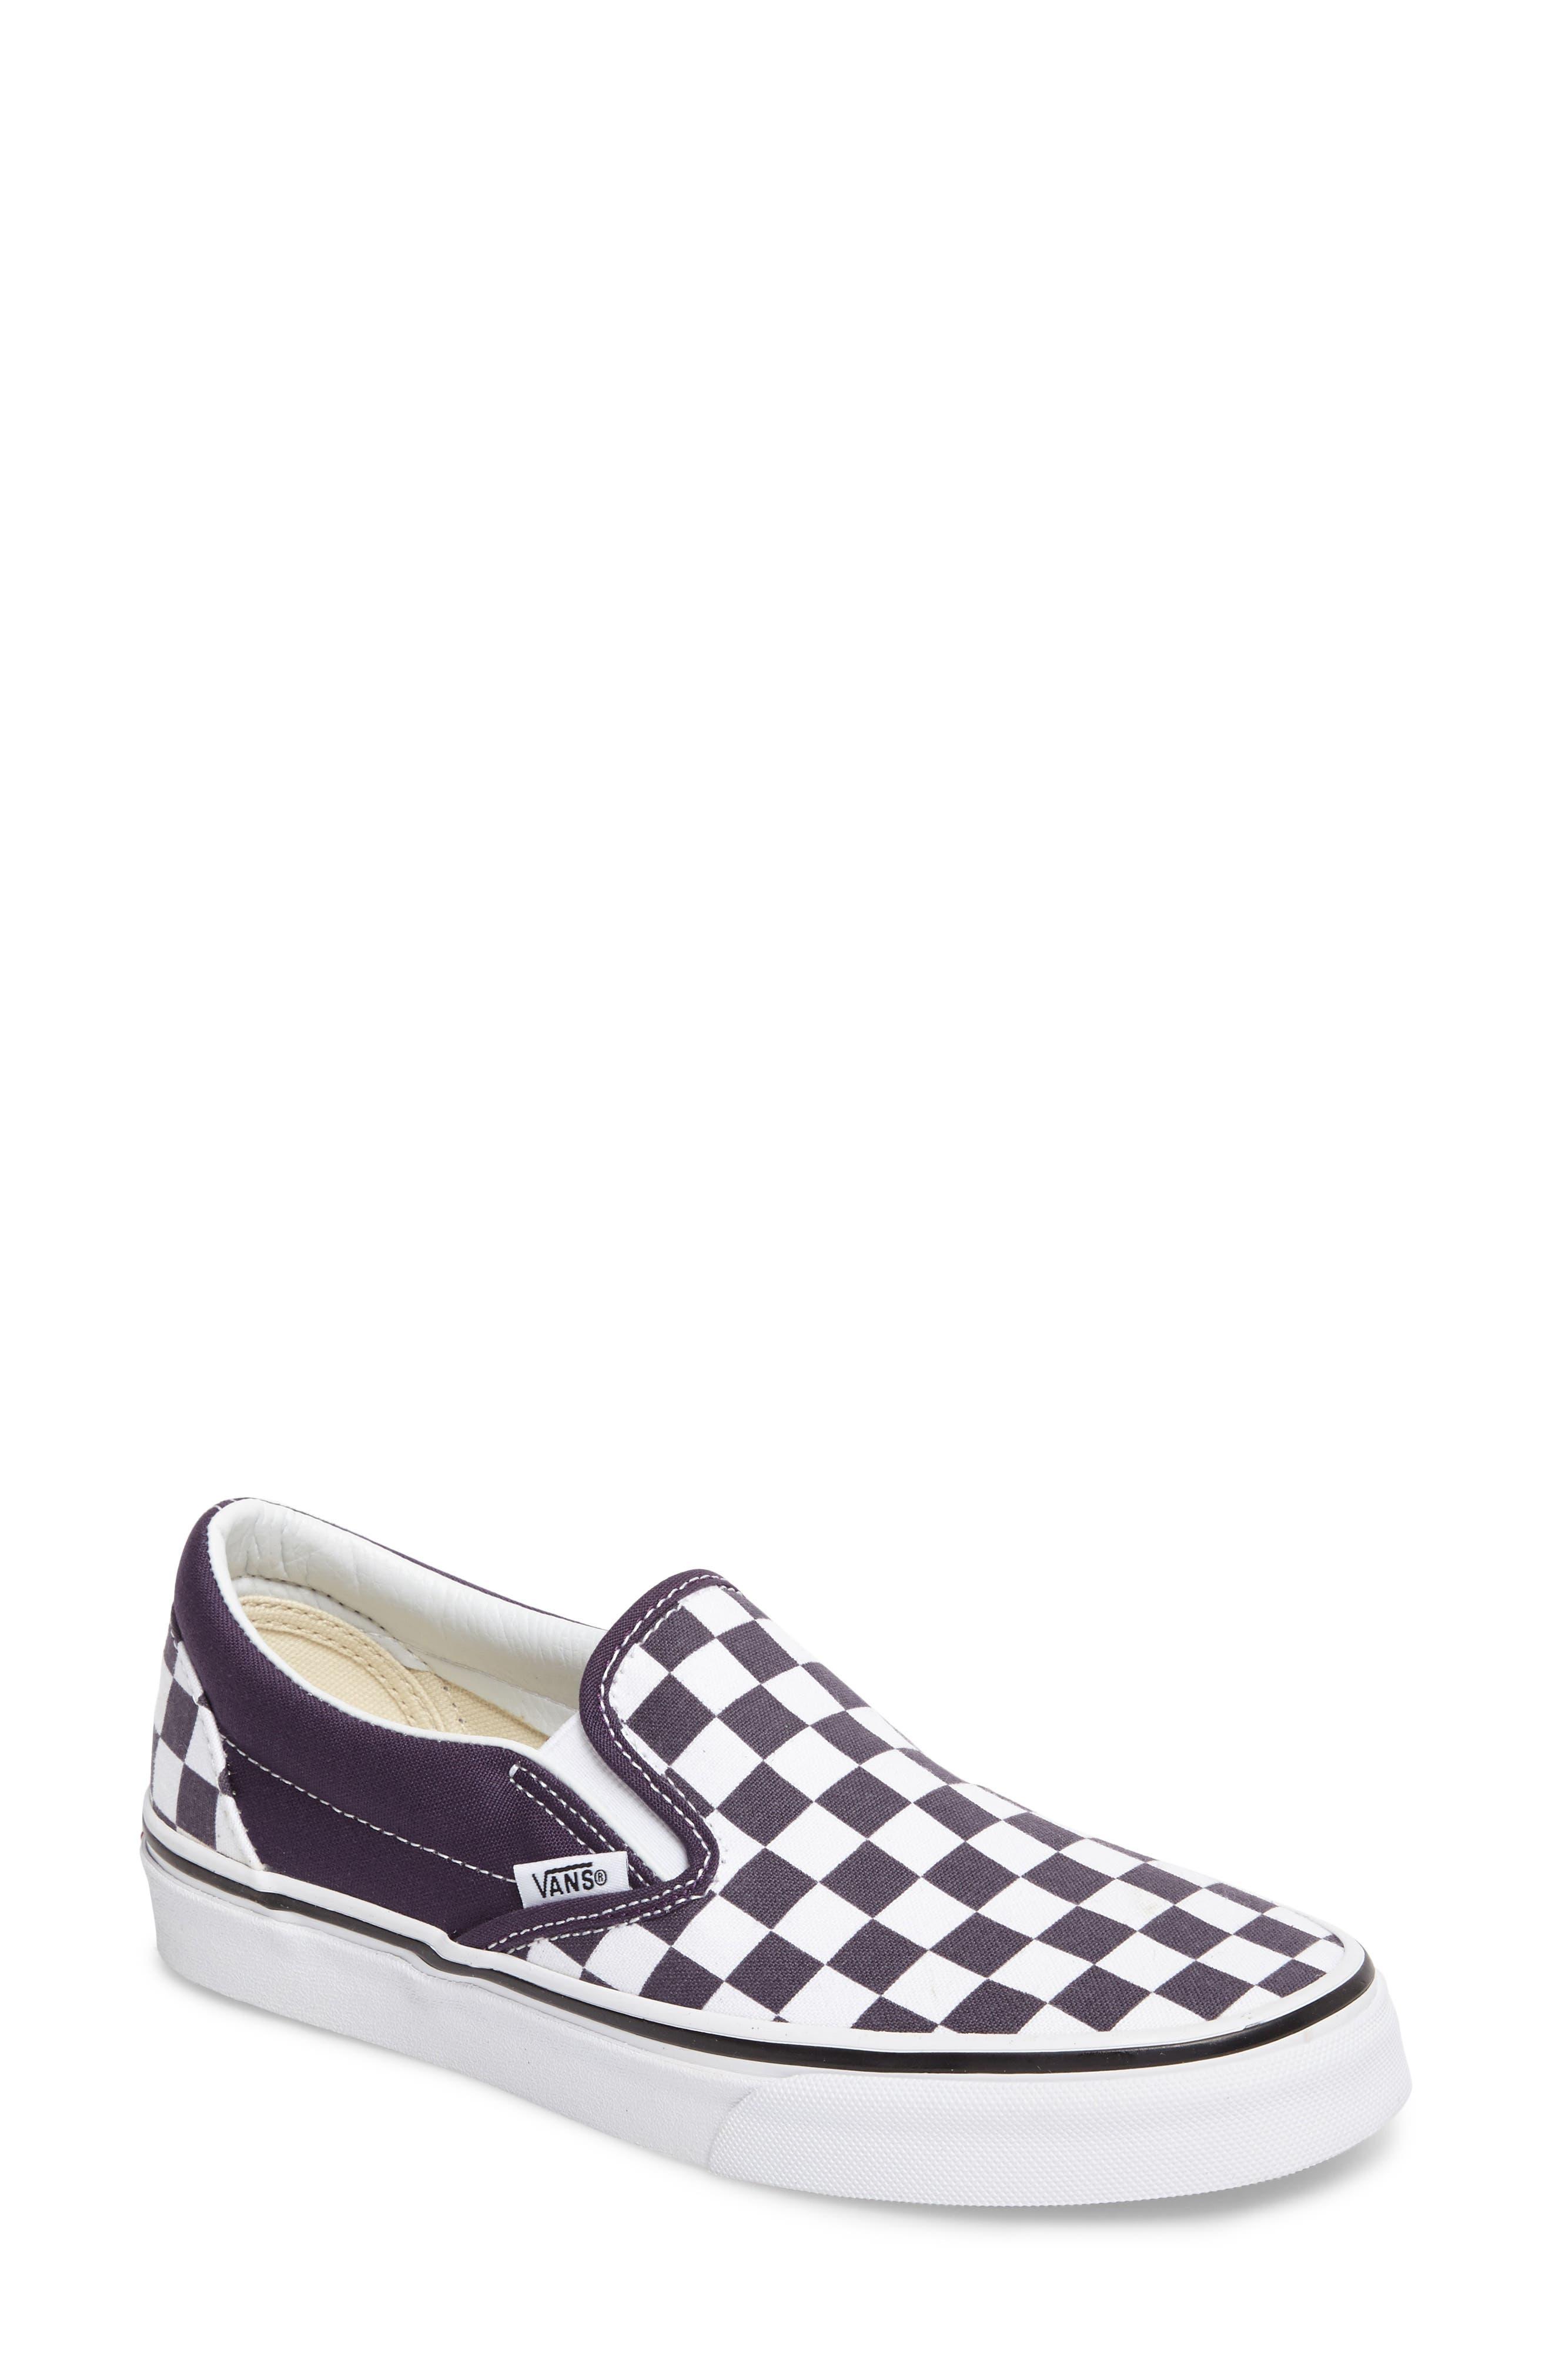 ,                             Classic Slip-On Sneaker,                             Main thumbnail 165, color,                             510